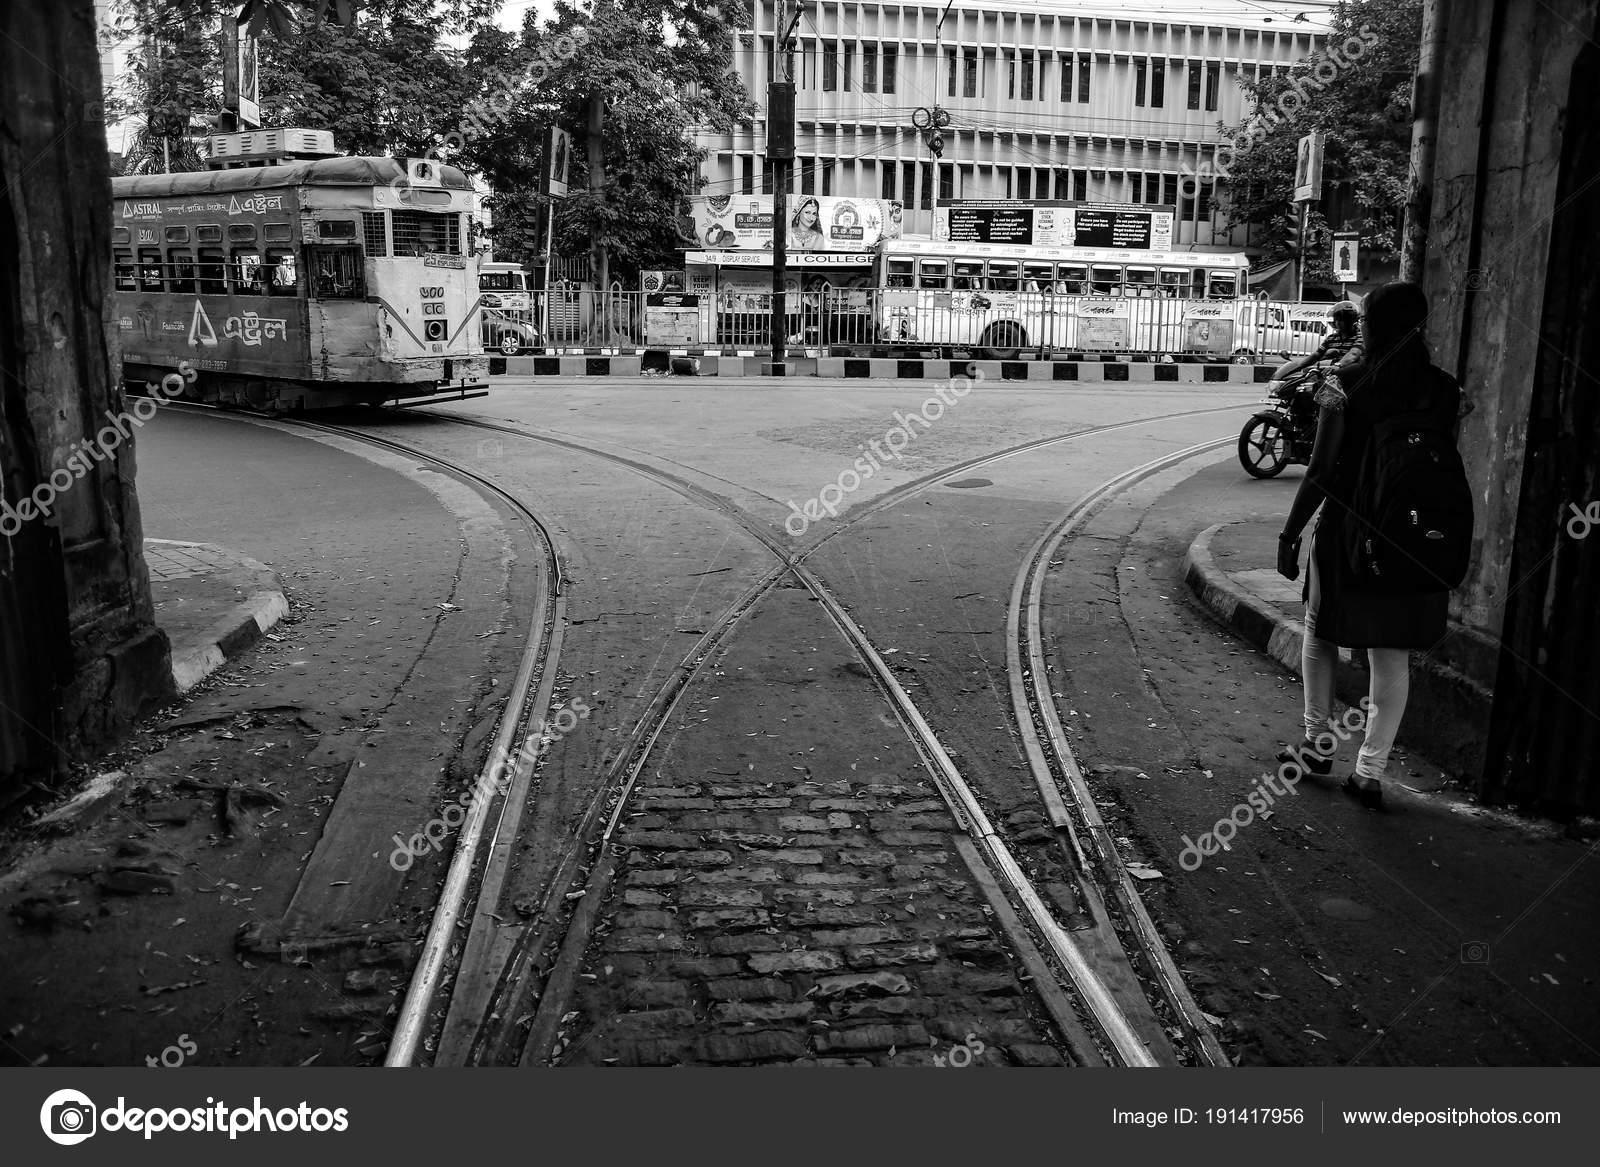 Tram approaching in a tram track junction depot in street of kolkata black and white kolkata india 2017 photo by shibu7213 gmail com